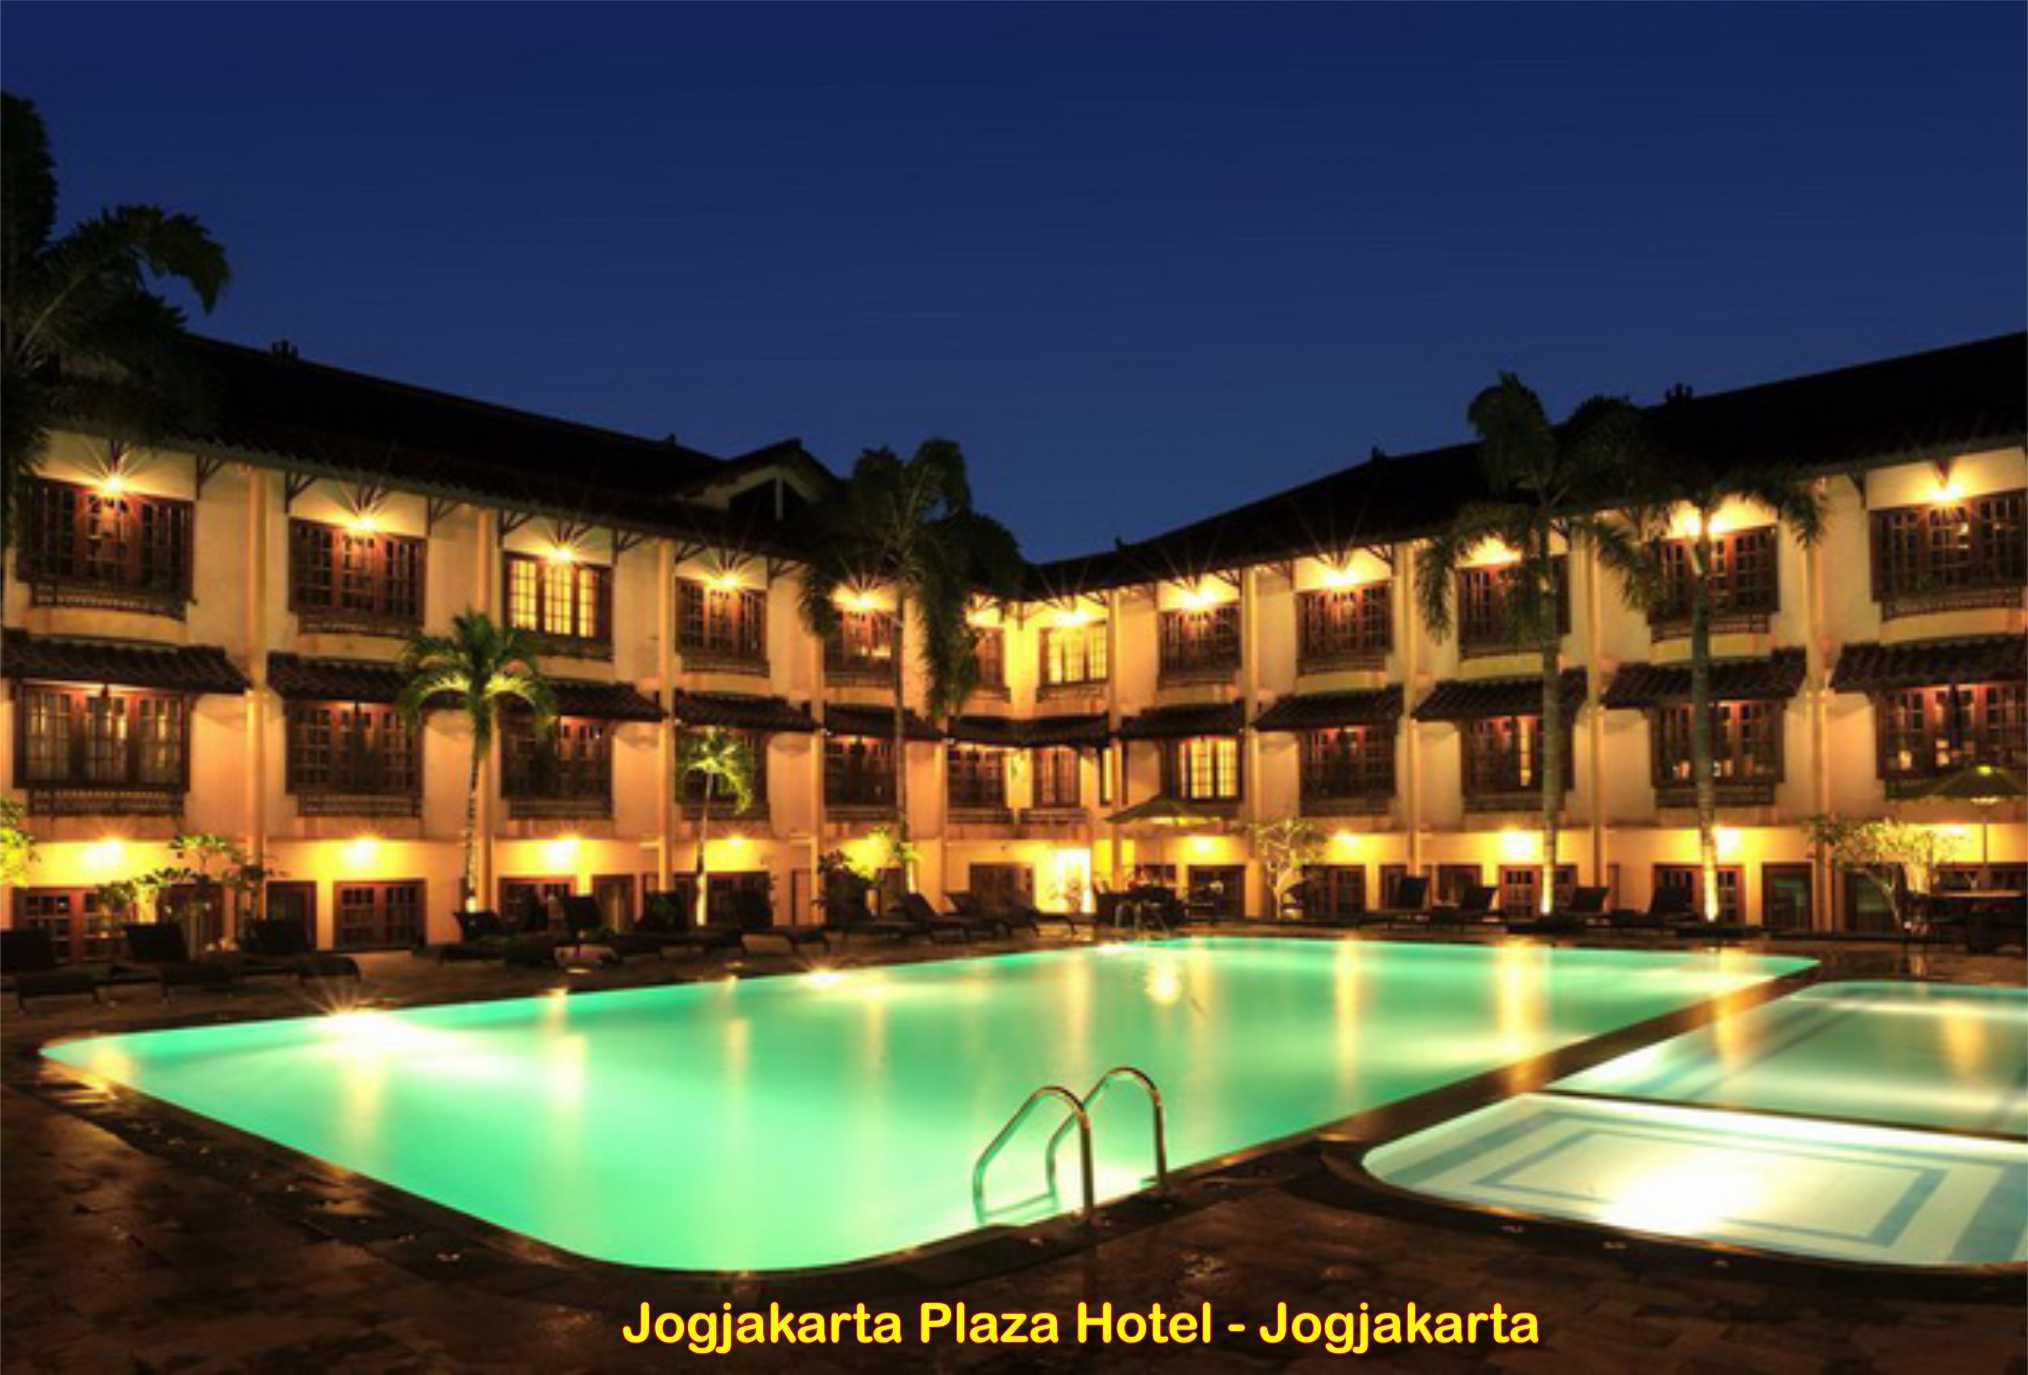 Jogjakarta Plaza Hotel, Jogjakarta - Indonesia 1